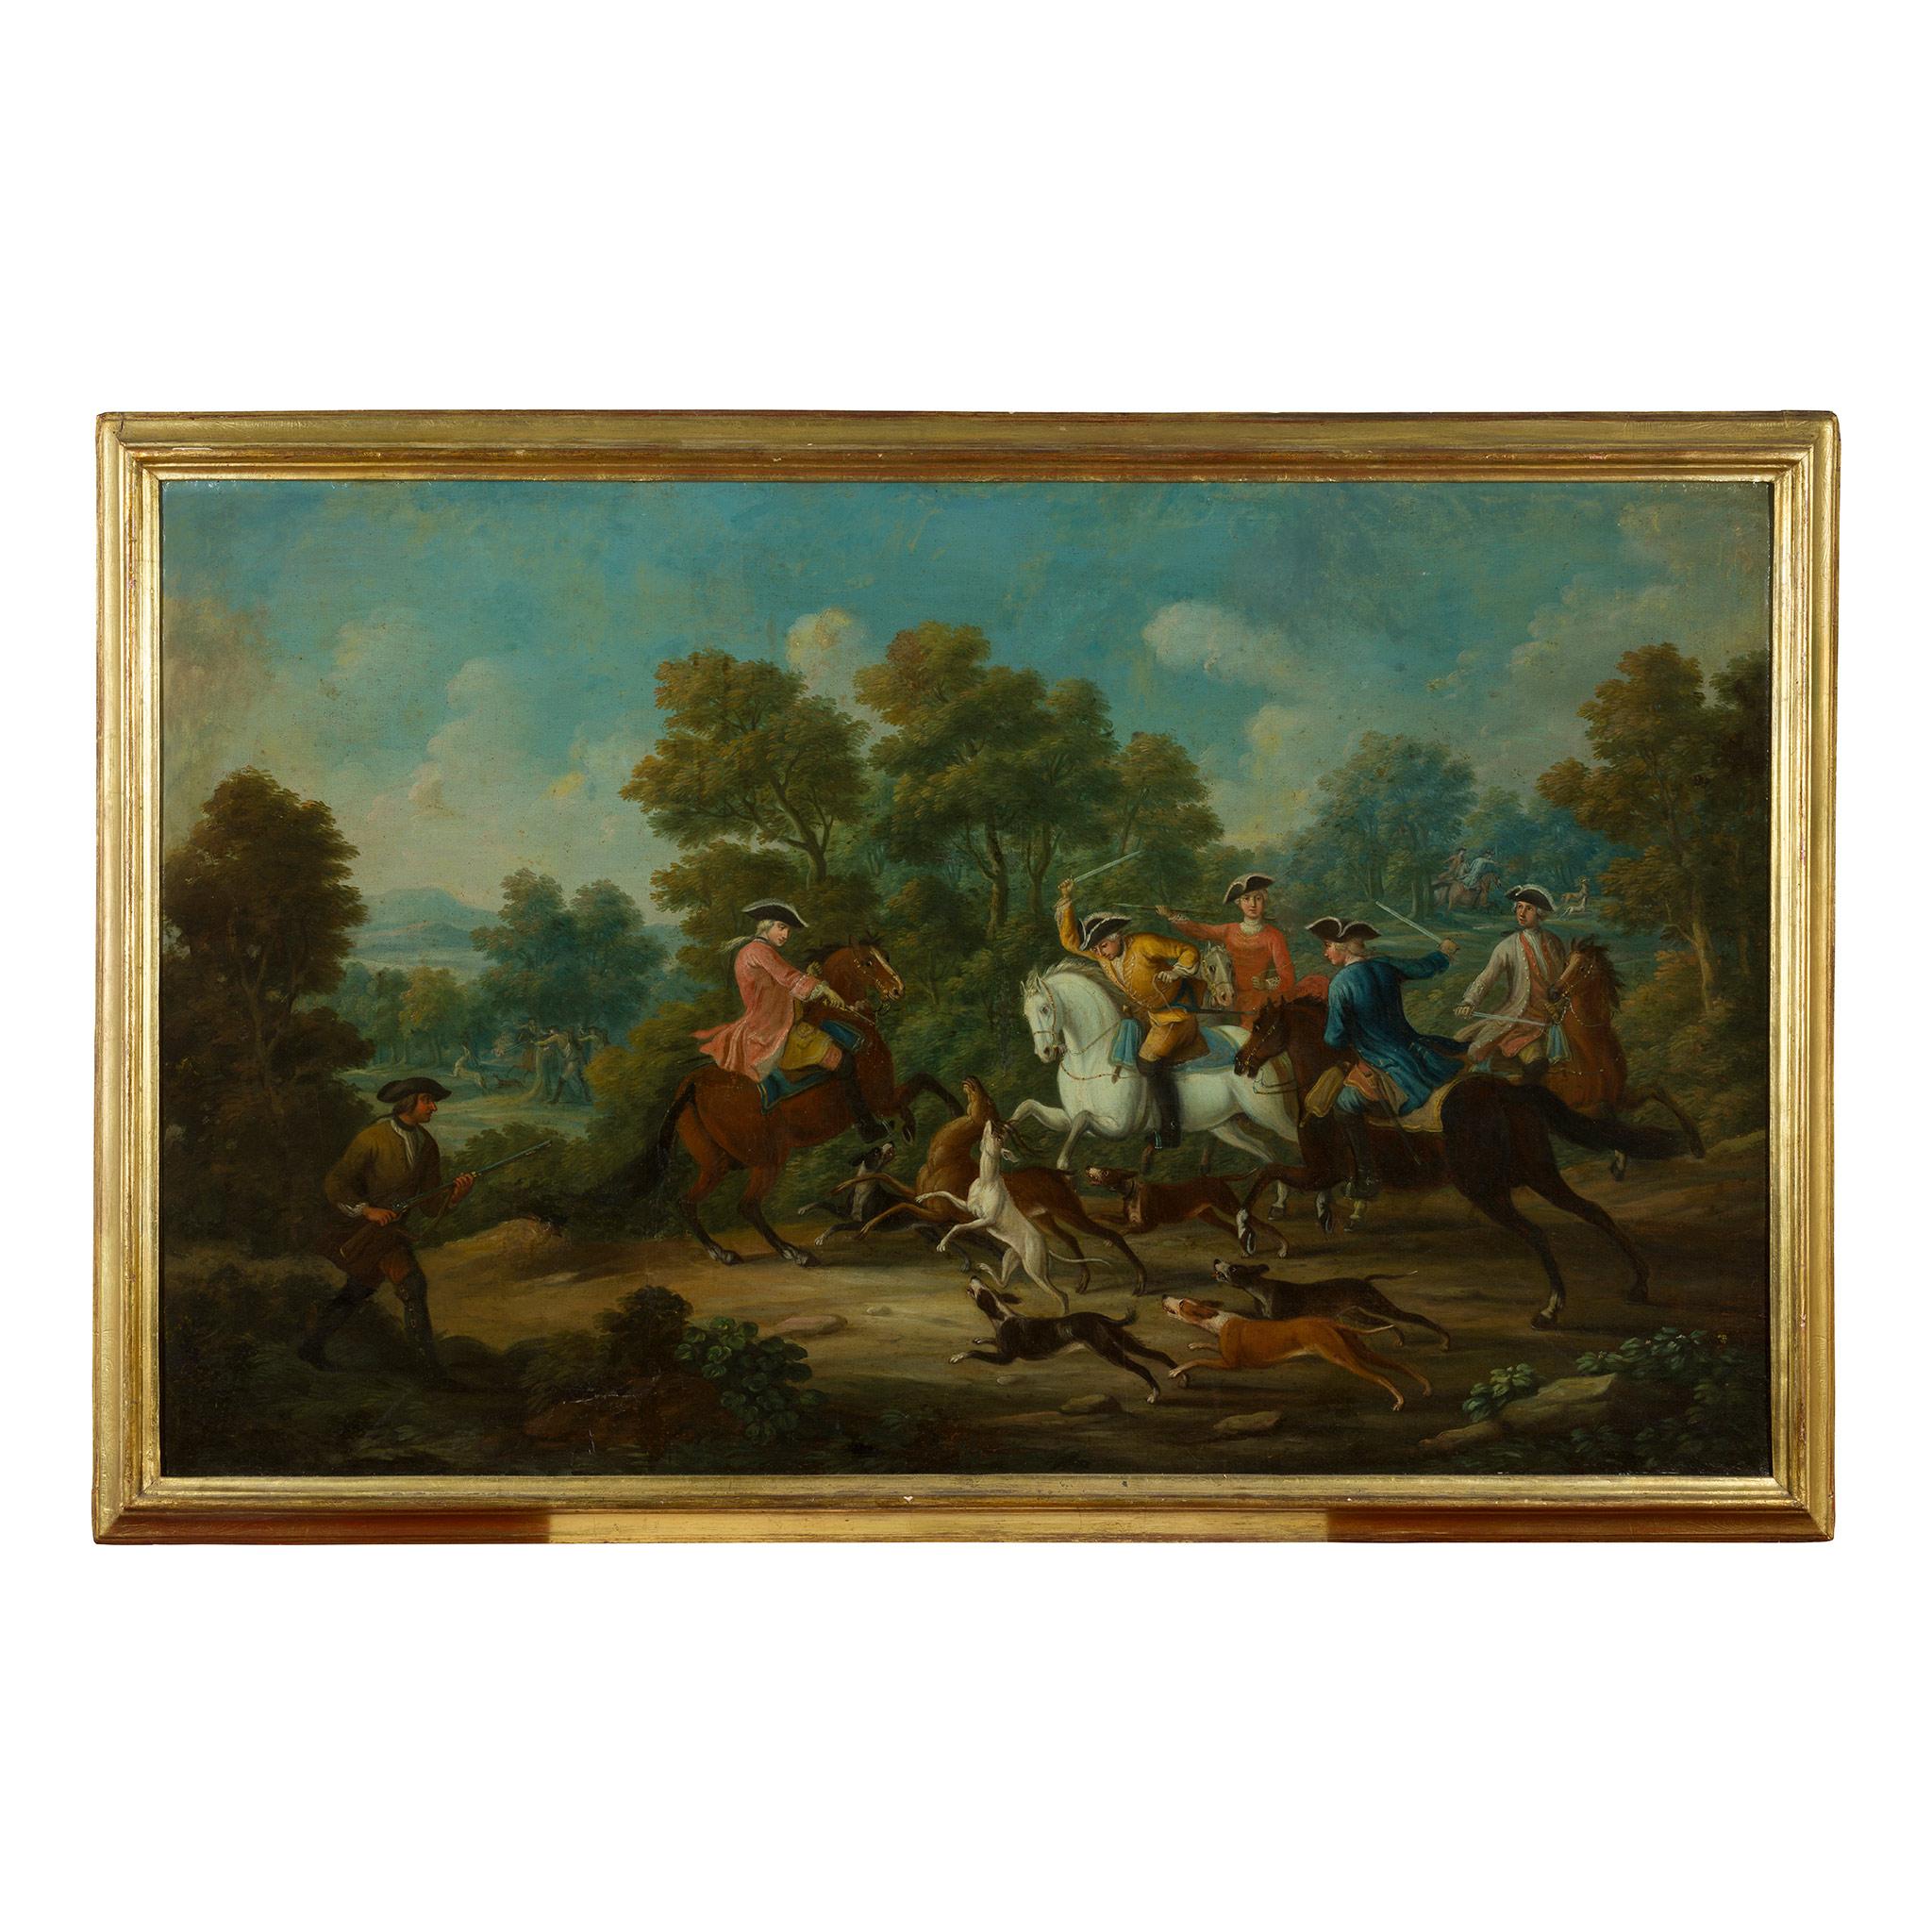 18TH CENTURY FRENCH SCHOOL ELEGANT FIGURES BOAR HUNTING - Image 8 of 8